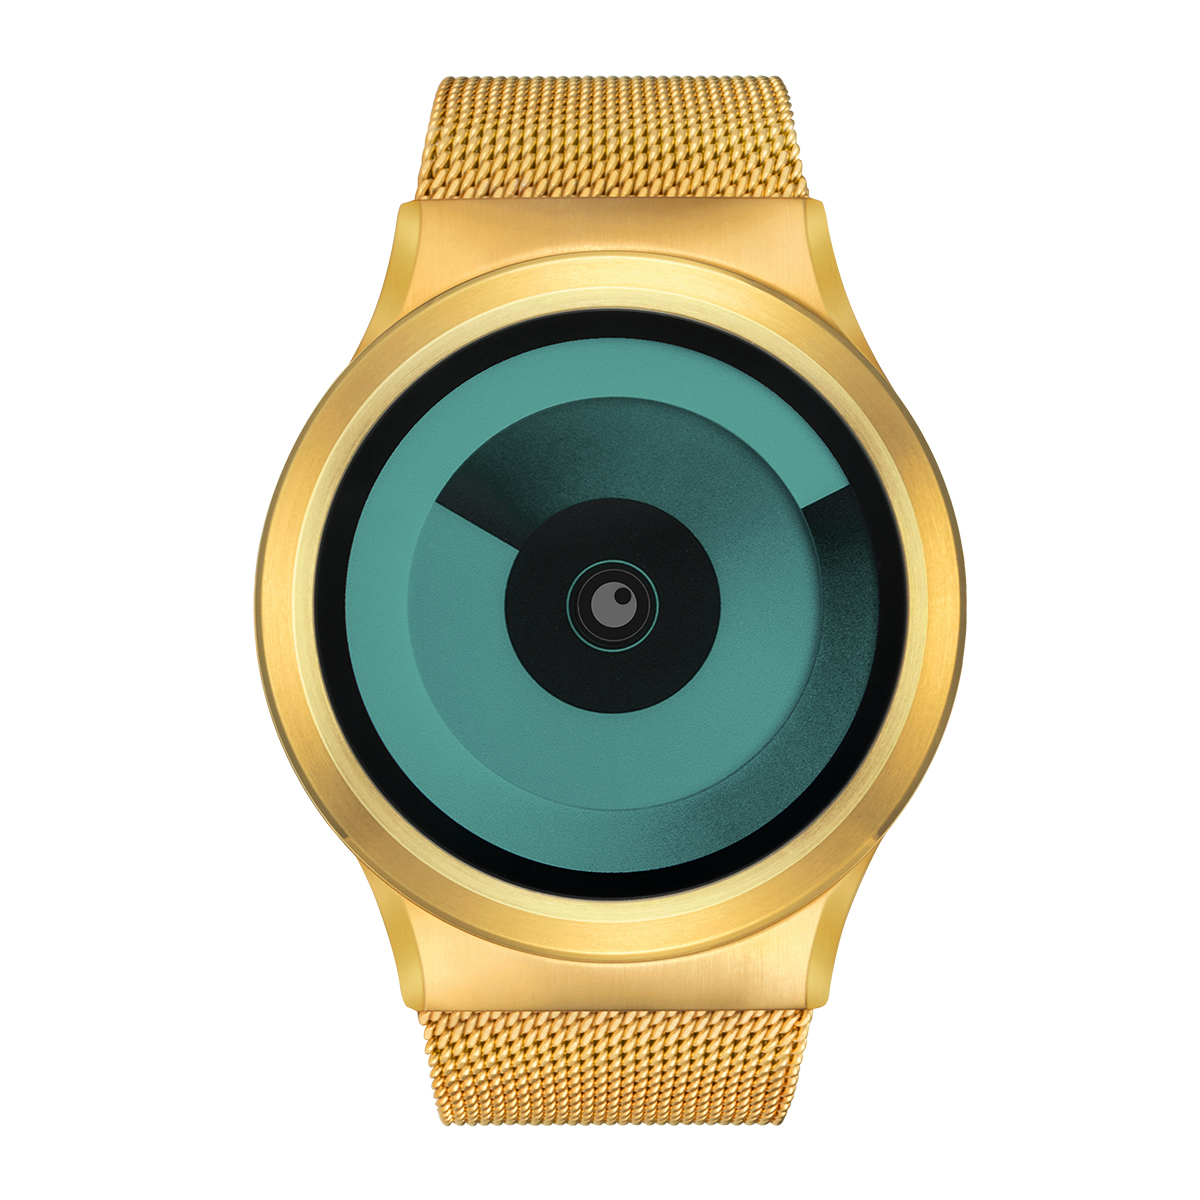 ZEROO SPIRAL GALAXY ゼロ 電池式クォーツ 腕時計 [W06018B04SM04] グリーン デザインウォッチ ペア用 メンズ レディース ユニセックス おしゃれ時計 デザイナーズ